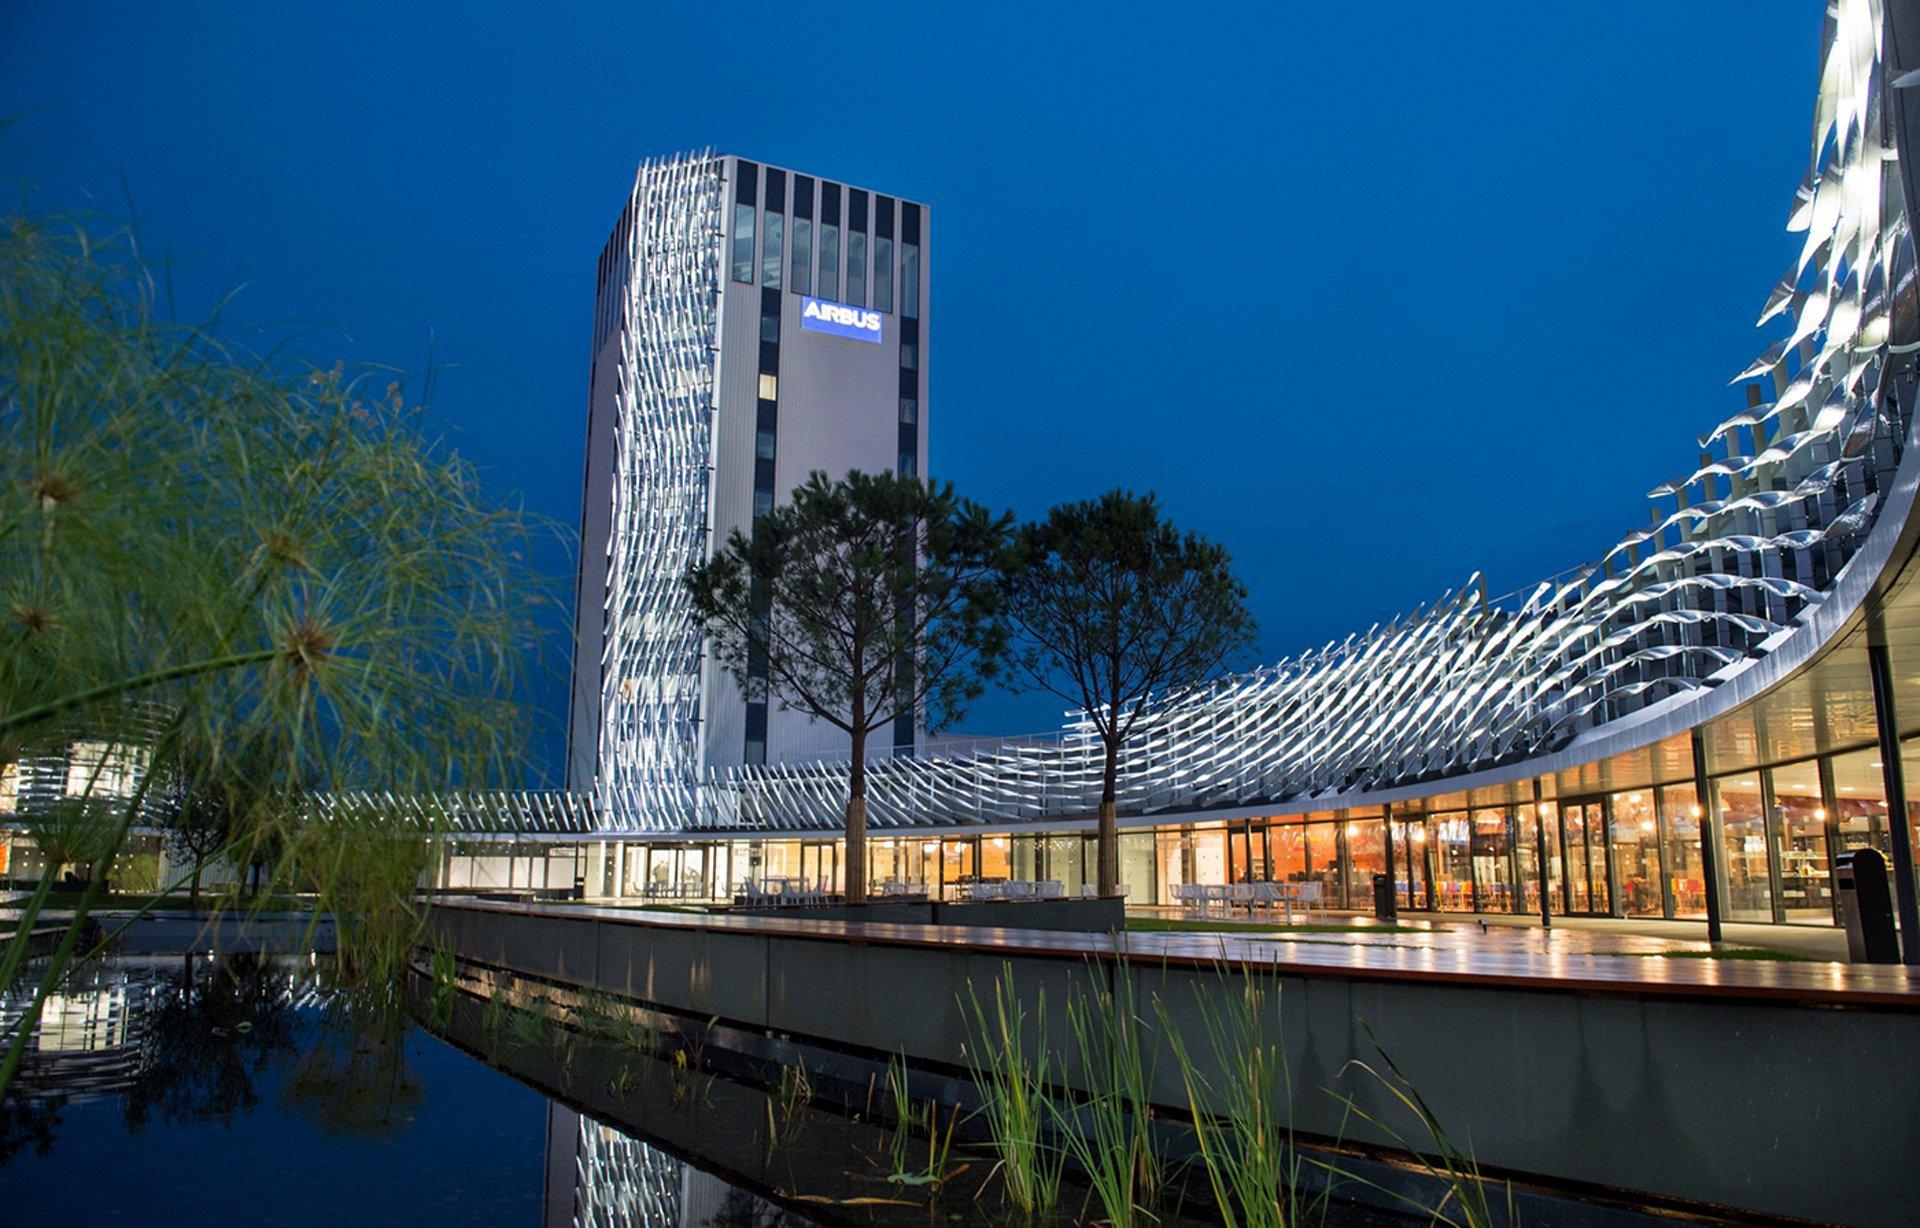 Airbus Leadership University